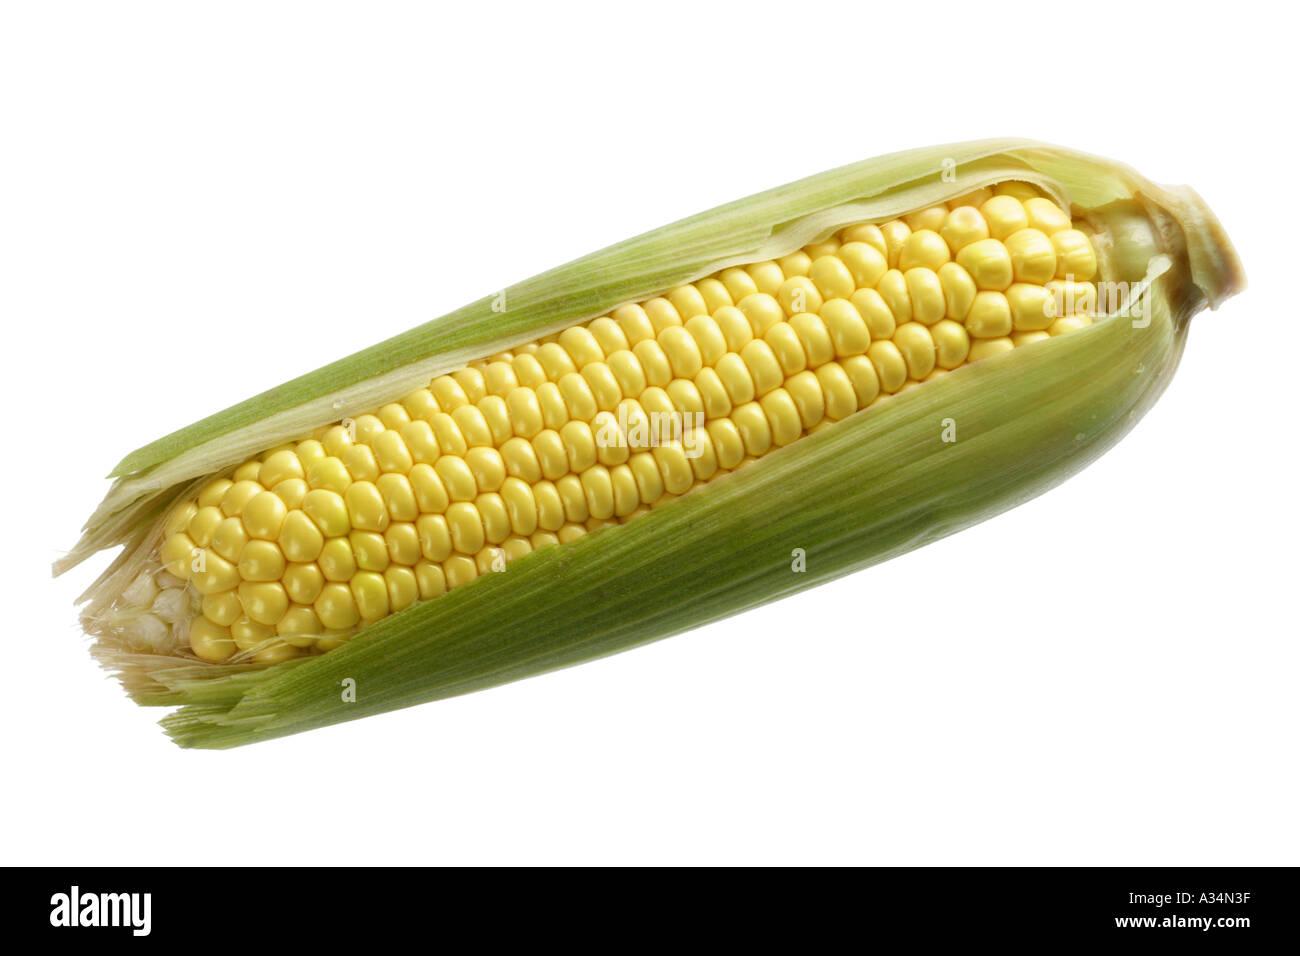 Fresh Corn on the Cob - Stock Image